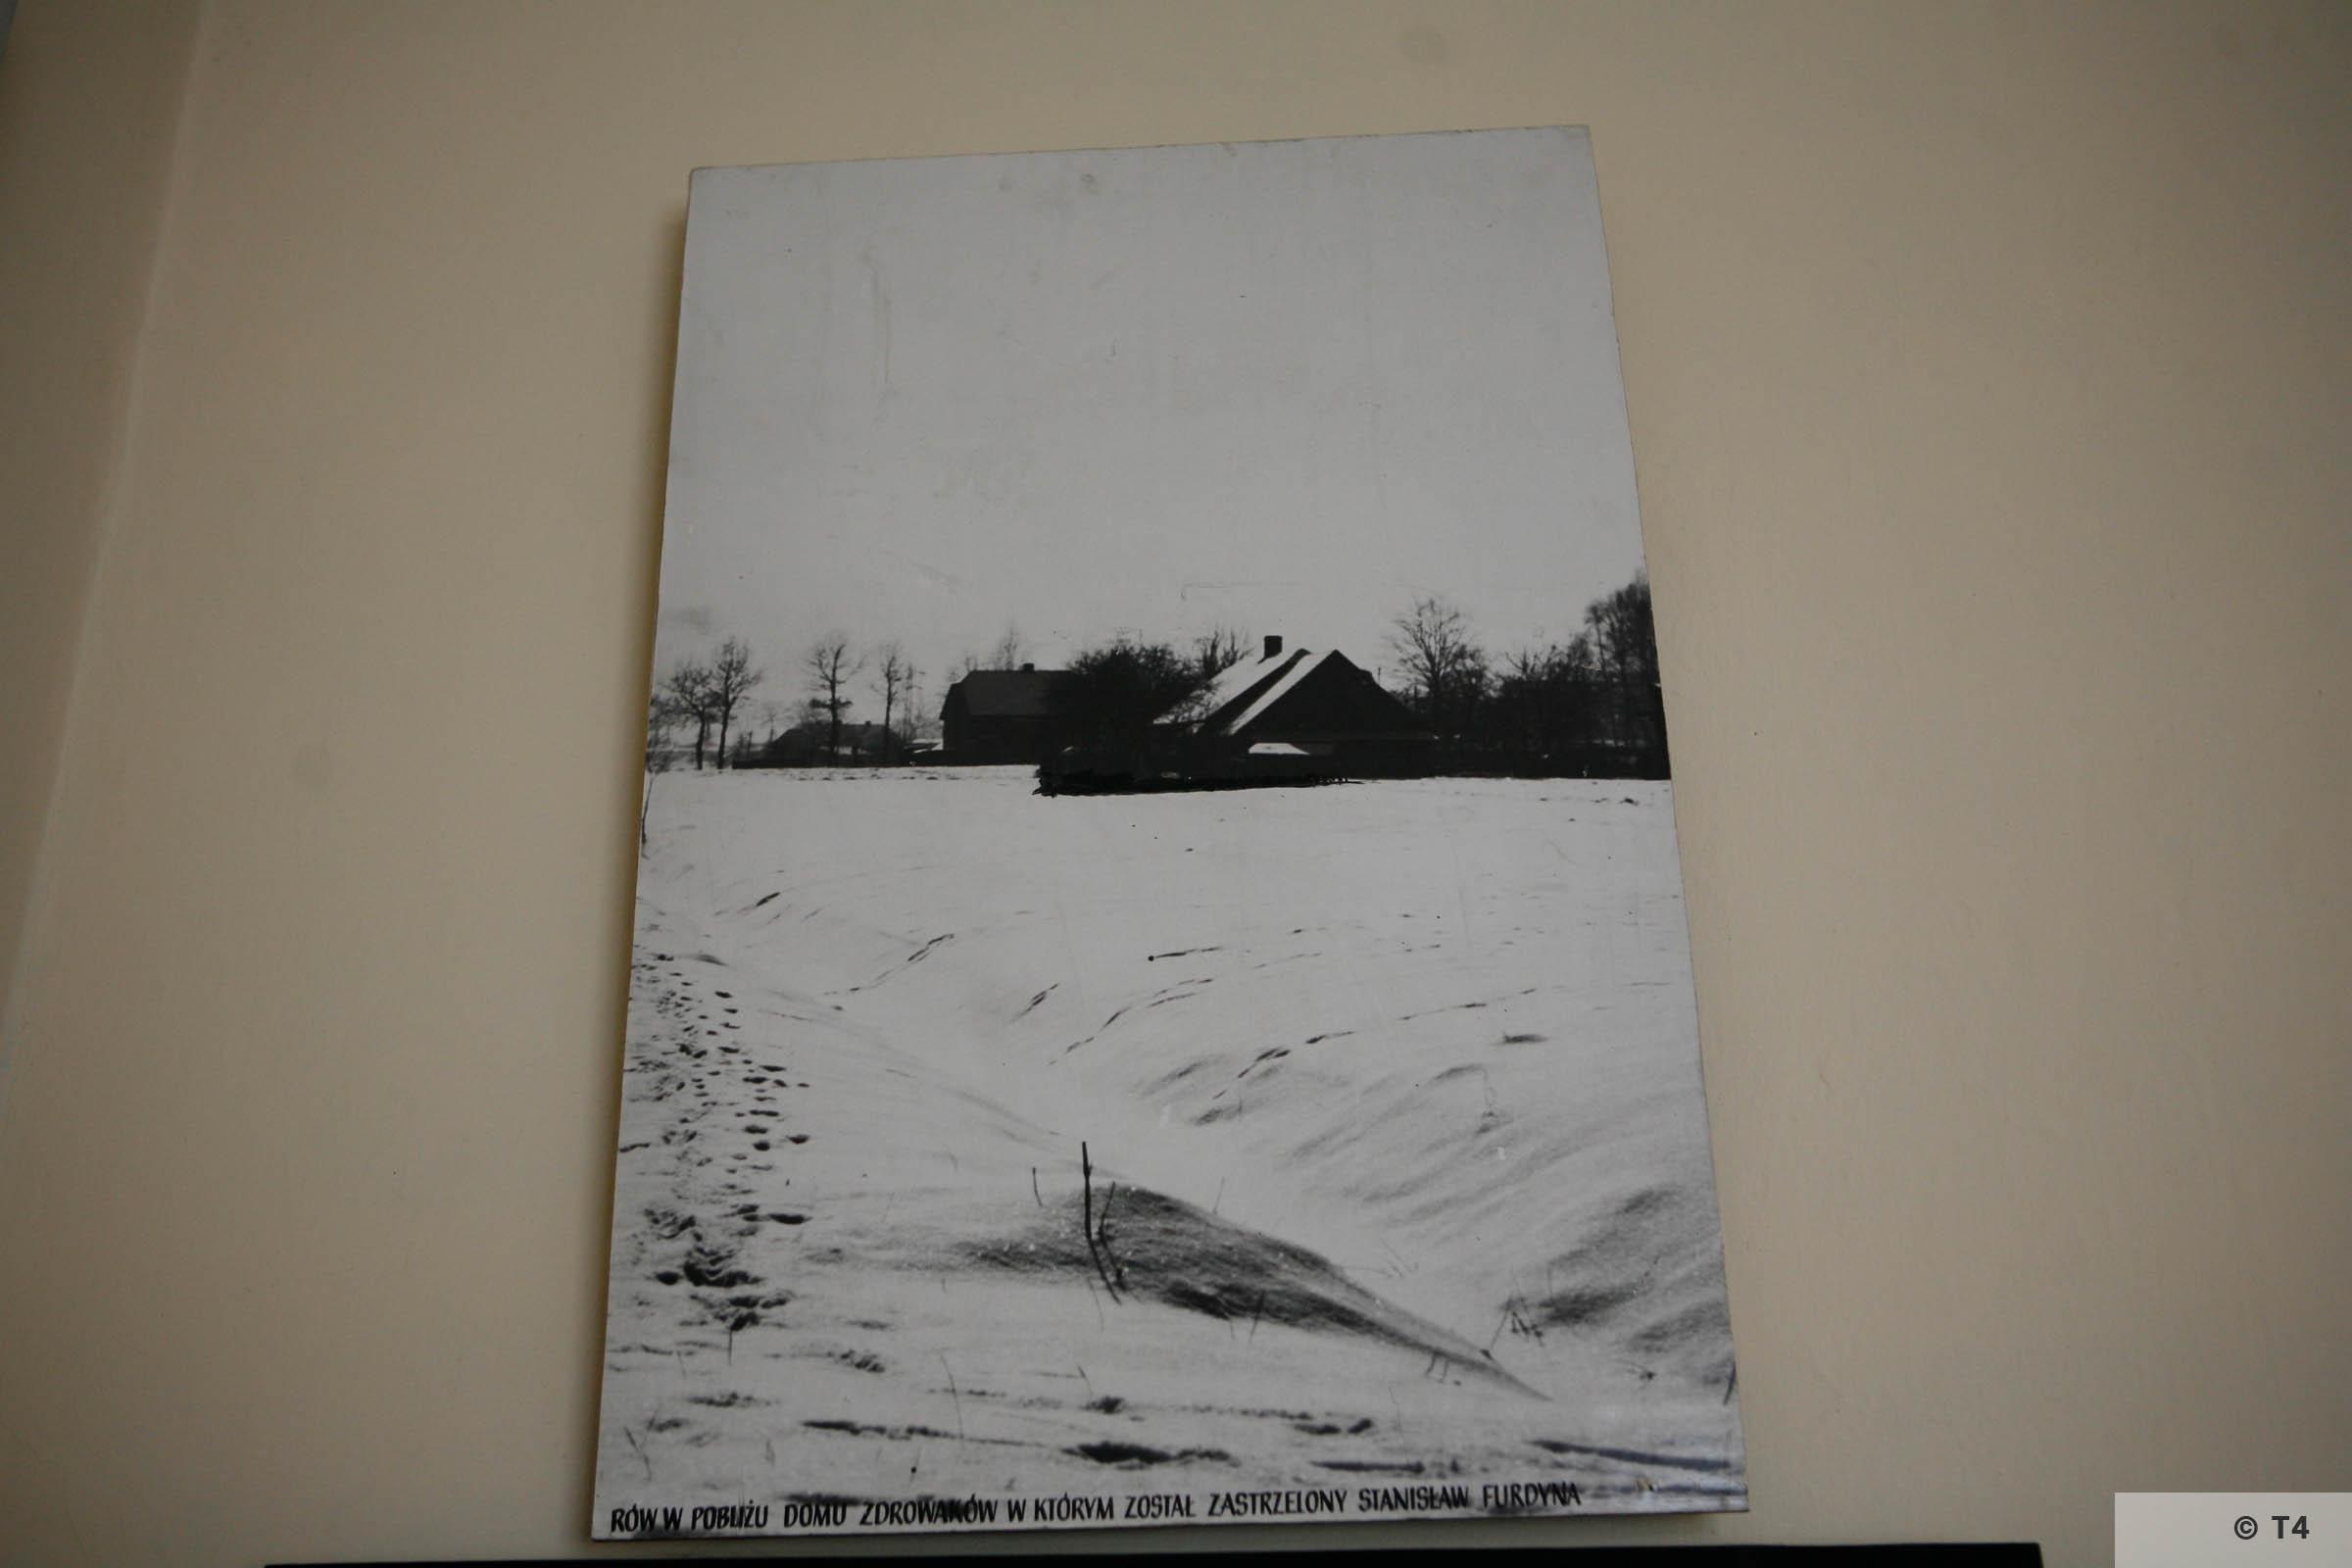 Exhibition in Budy School. 2006 T4 4934